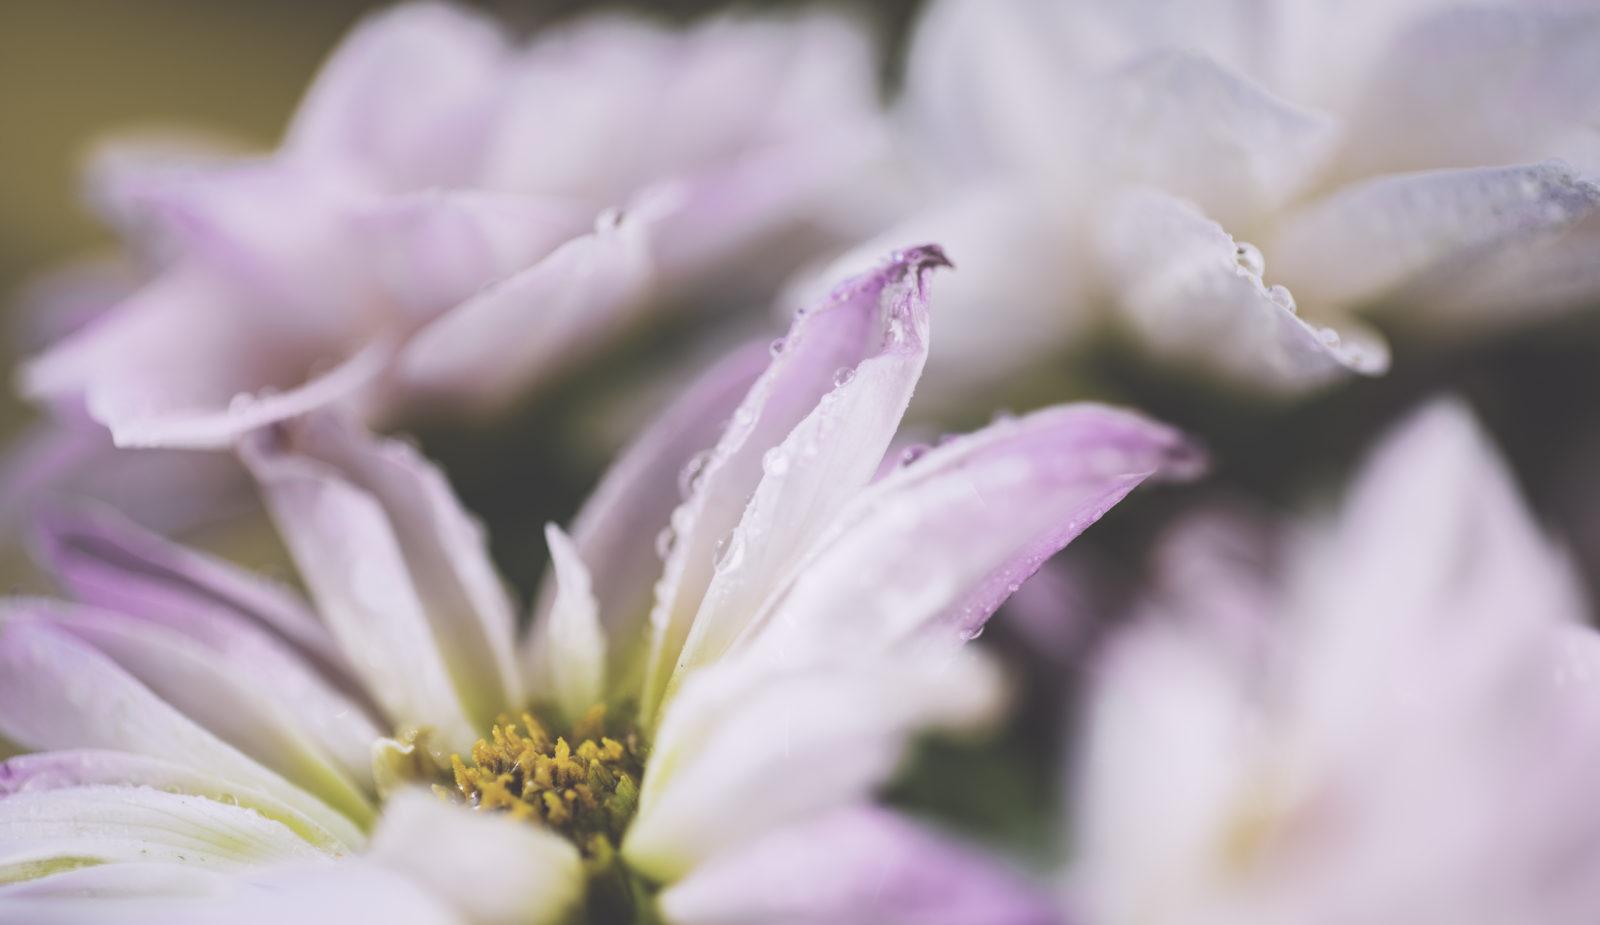 Dew drops on petals of pink flowers.